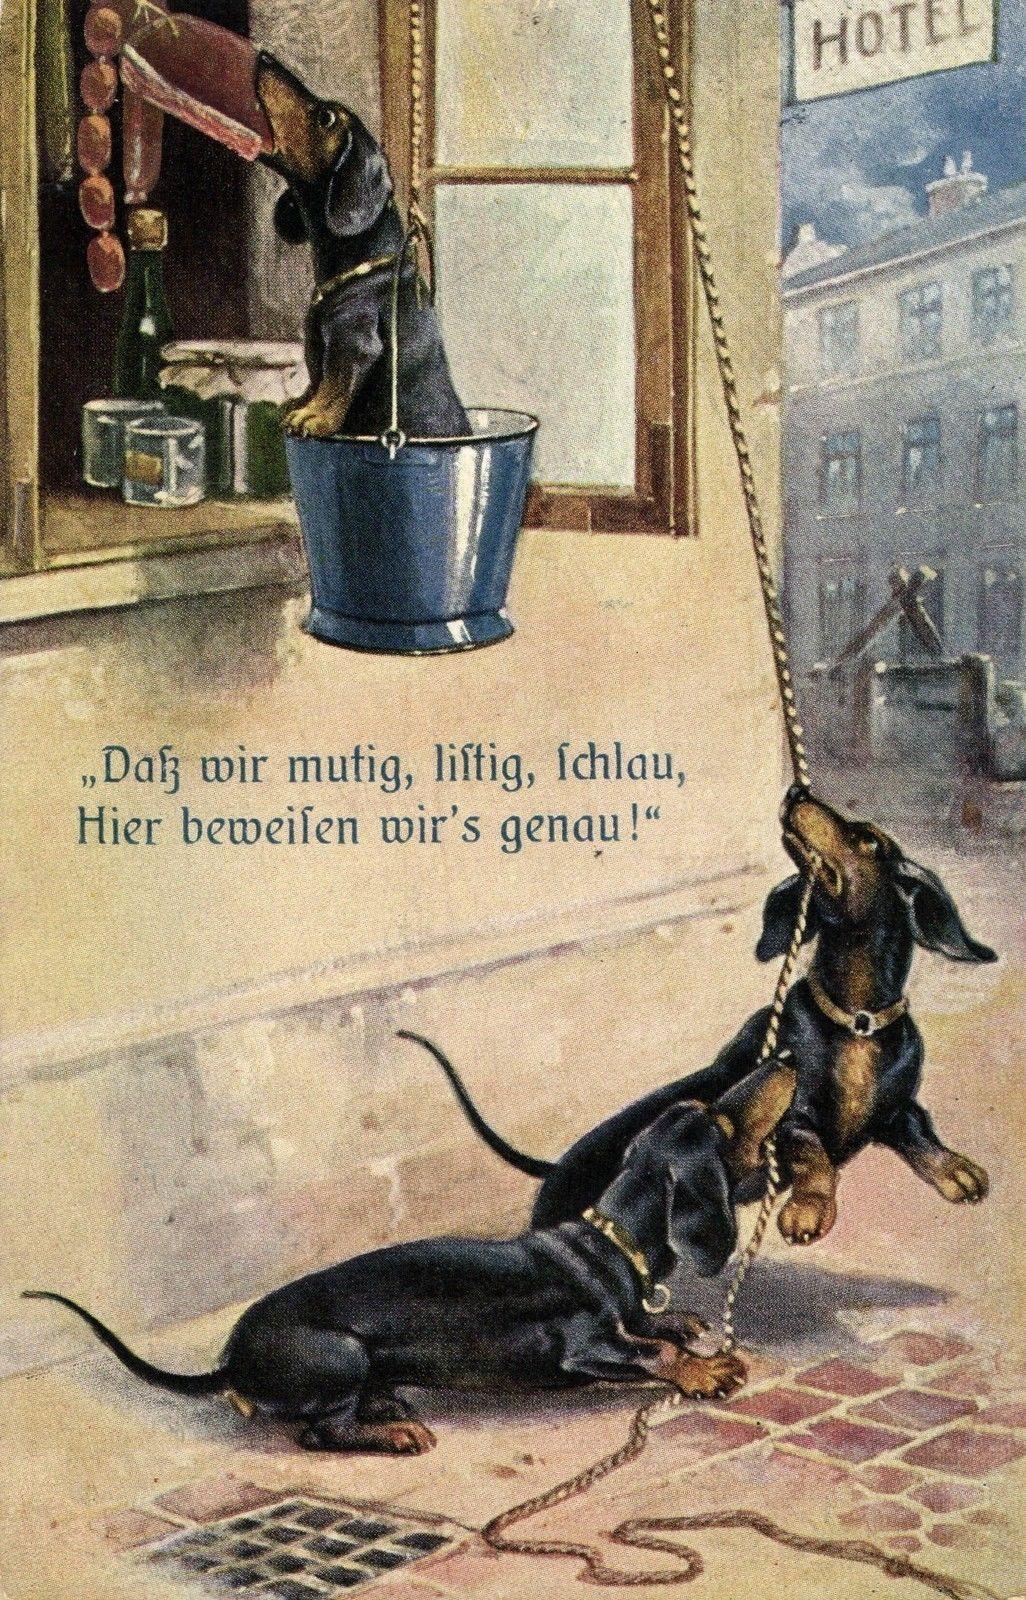 Dachshund Teckel Dog Stealing Meat German Artist Postcard 1918